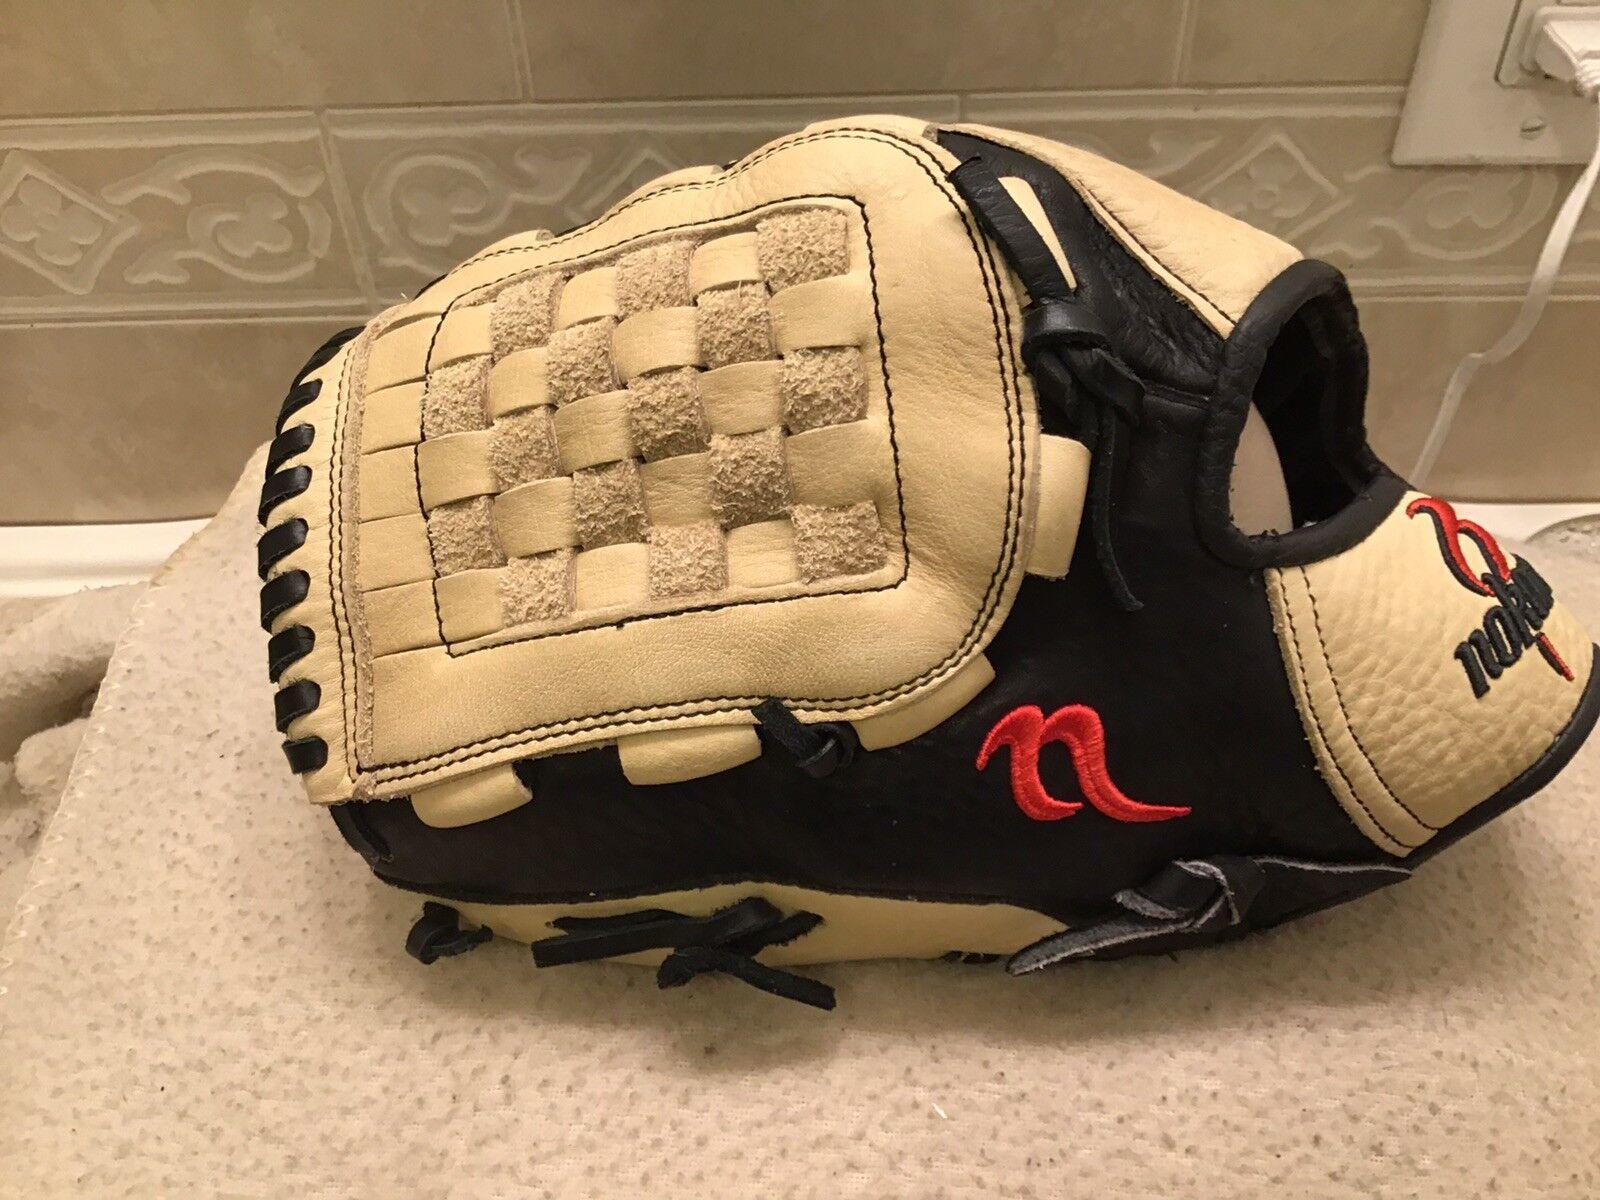 "Nokona Krome  NKK1251 NKK1251  12.5"" Baseball Softball Pitchers Glove Left Hand Throw cc22c5"